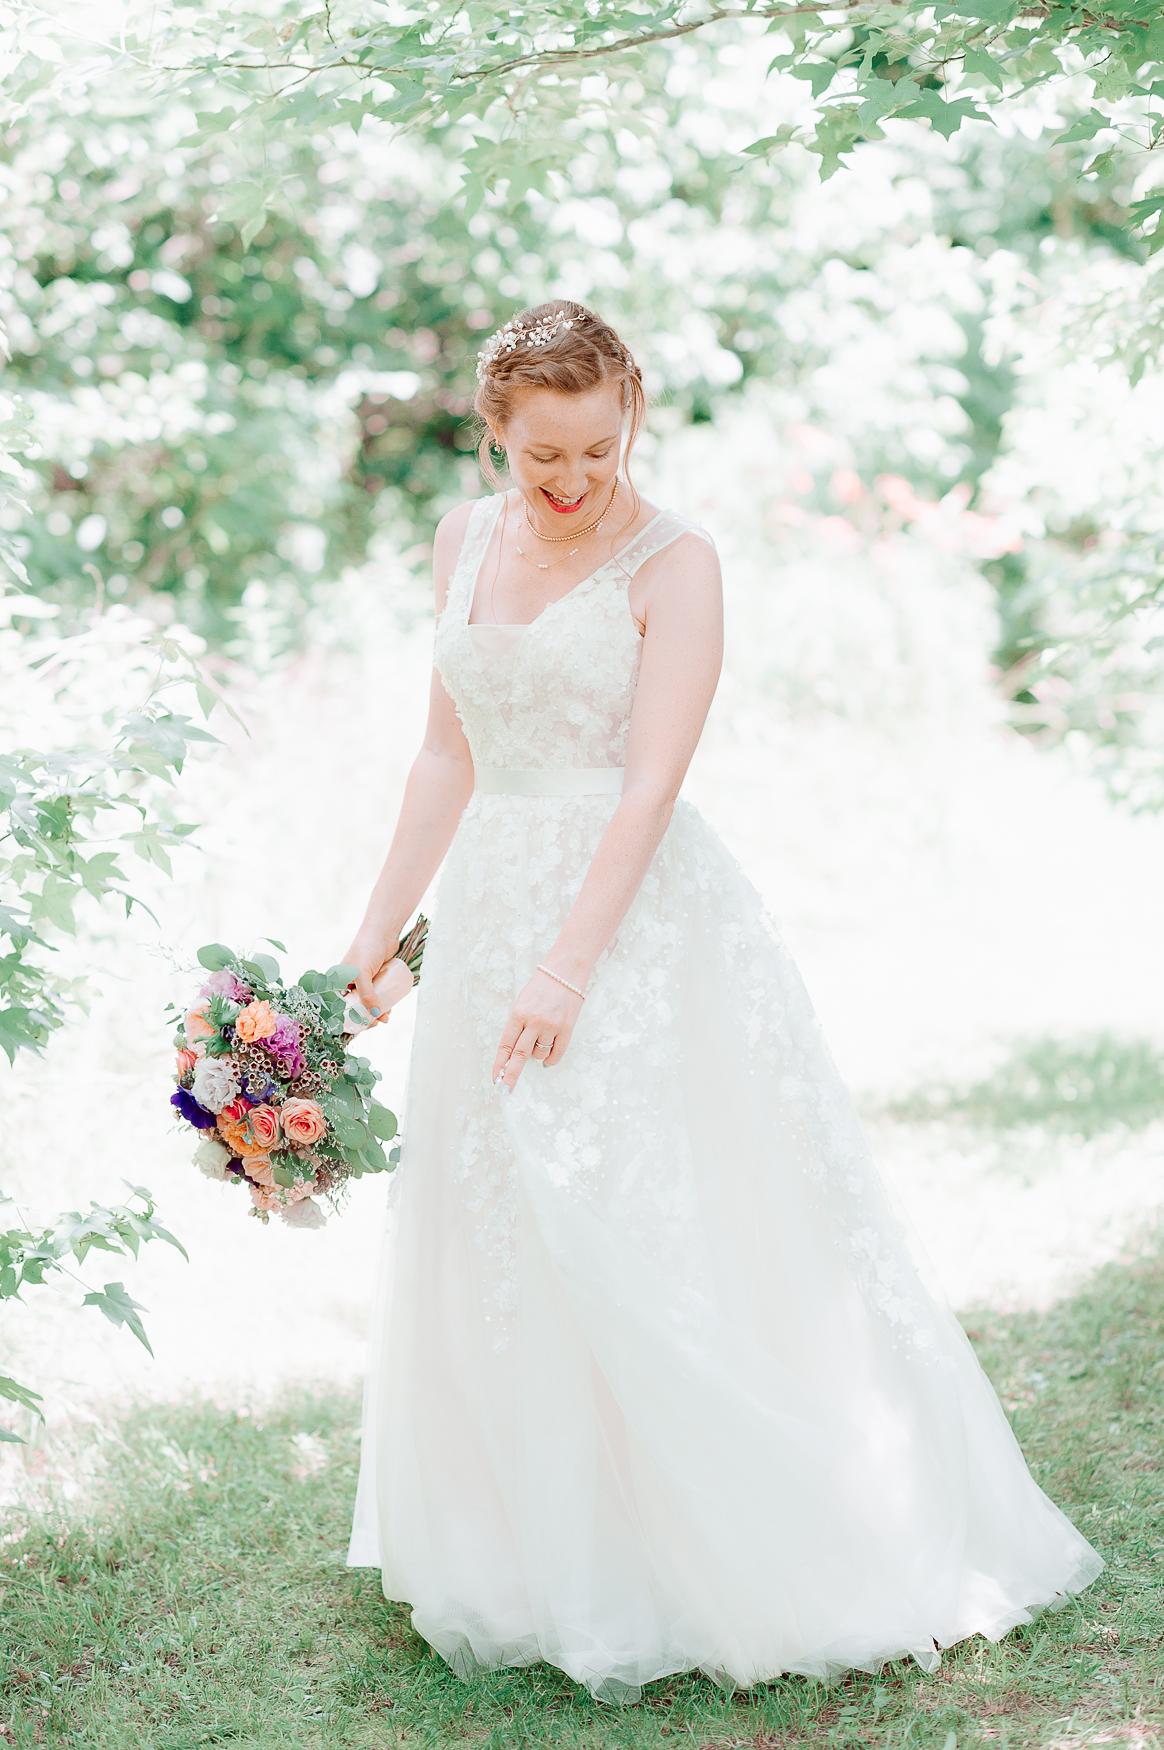 virginiawedding_theGlasgowFarm_rusticwedding_fredericksburg_youseephotography_CarolineDale (70).jpg